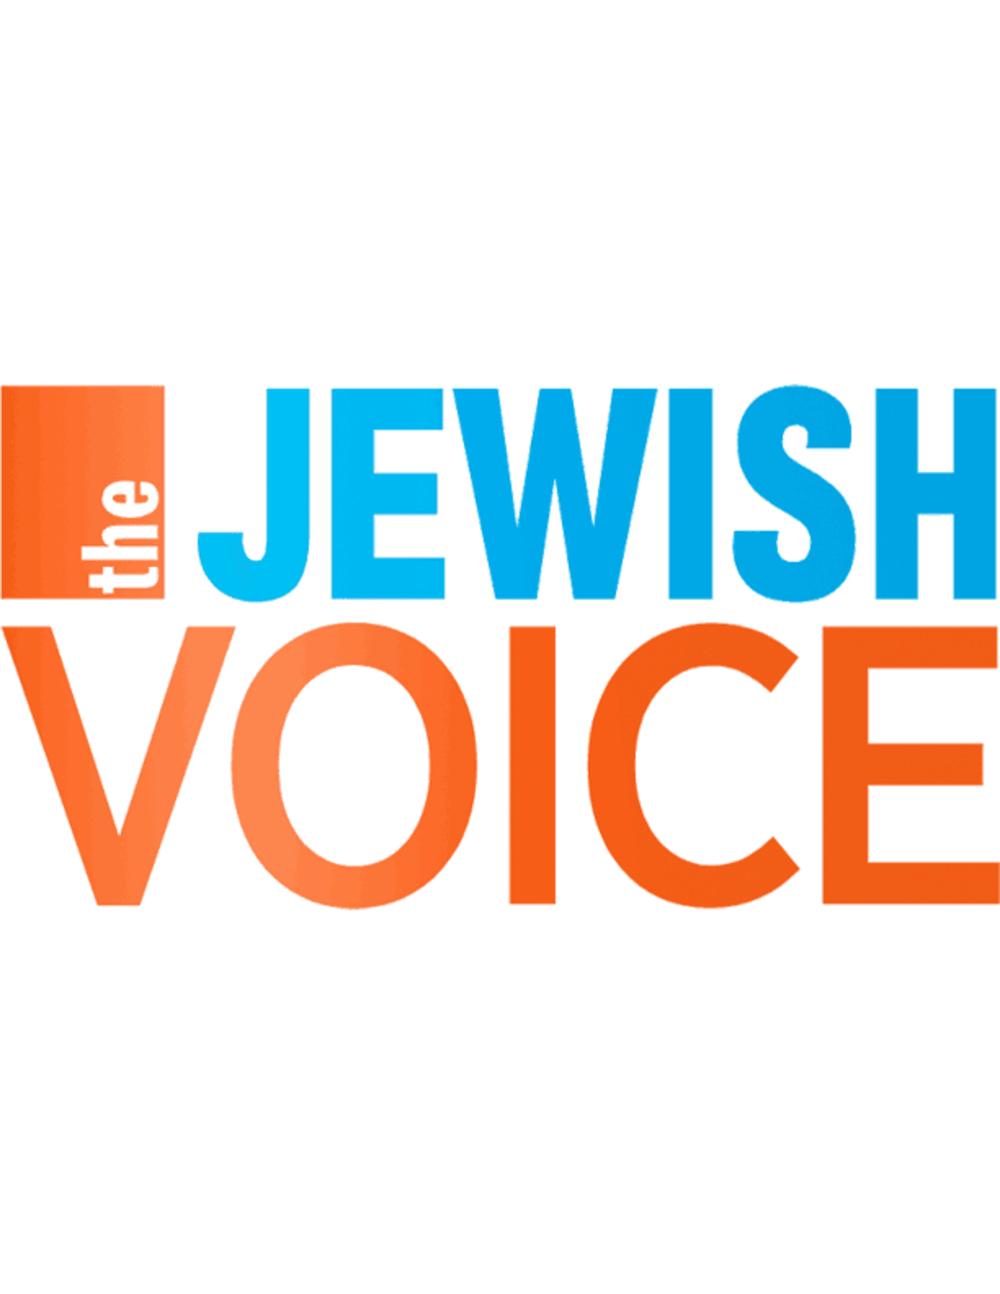 The Jewish Voice